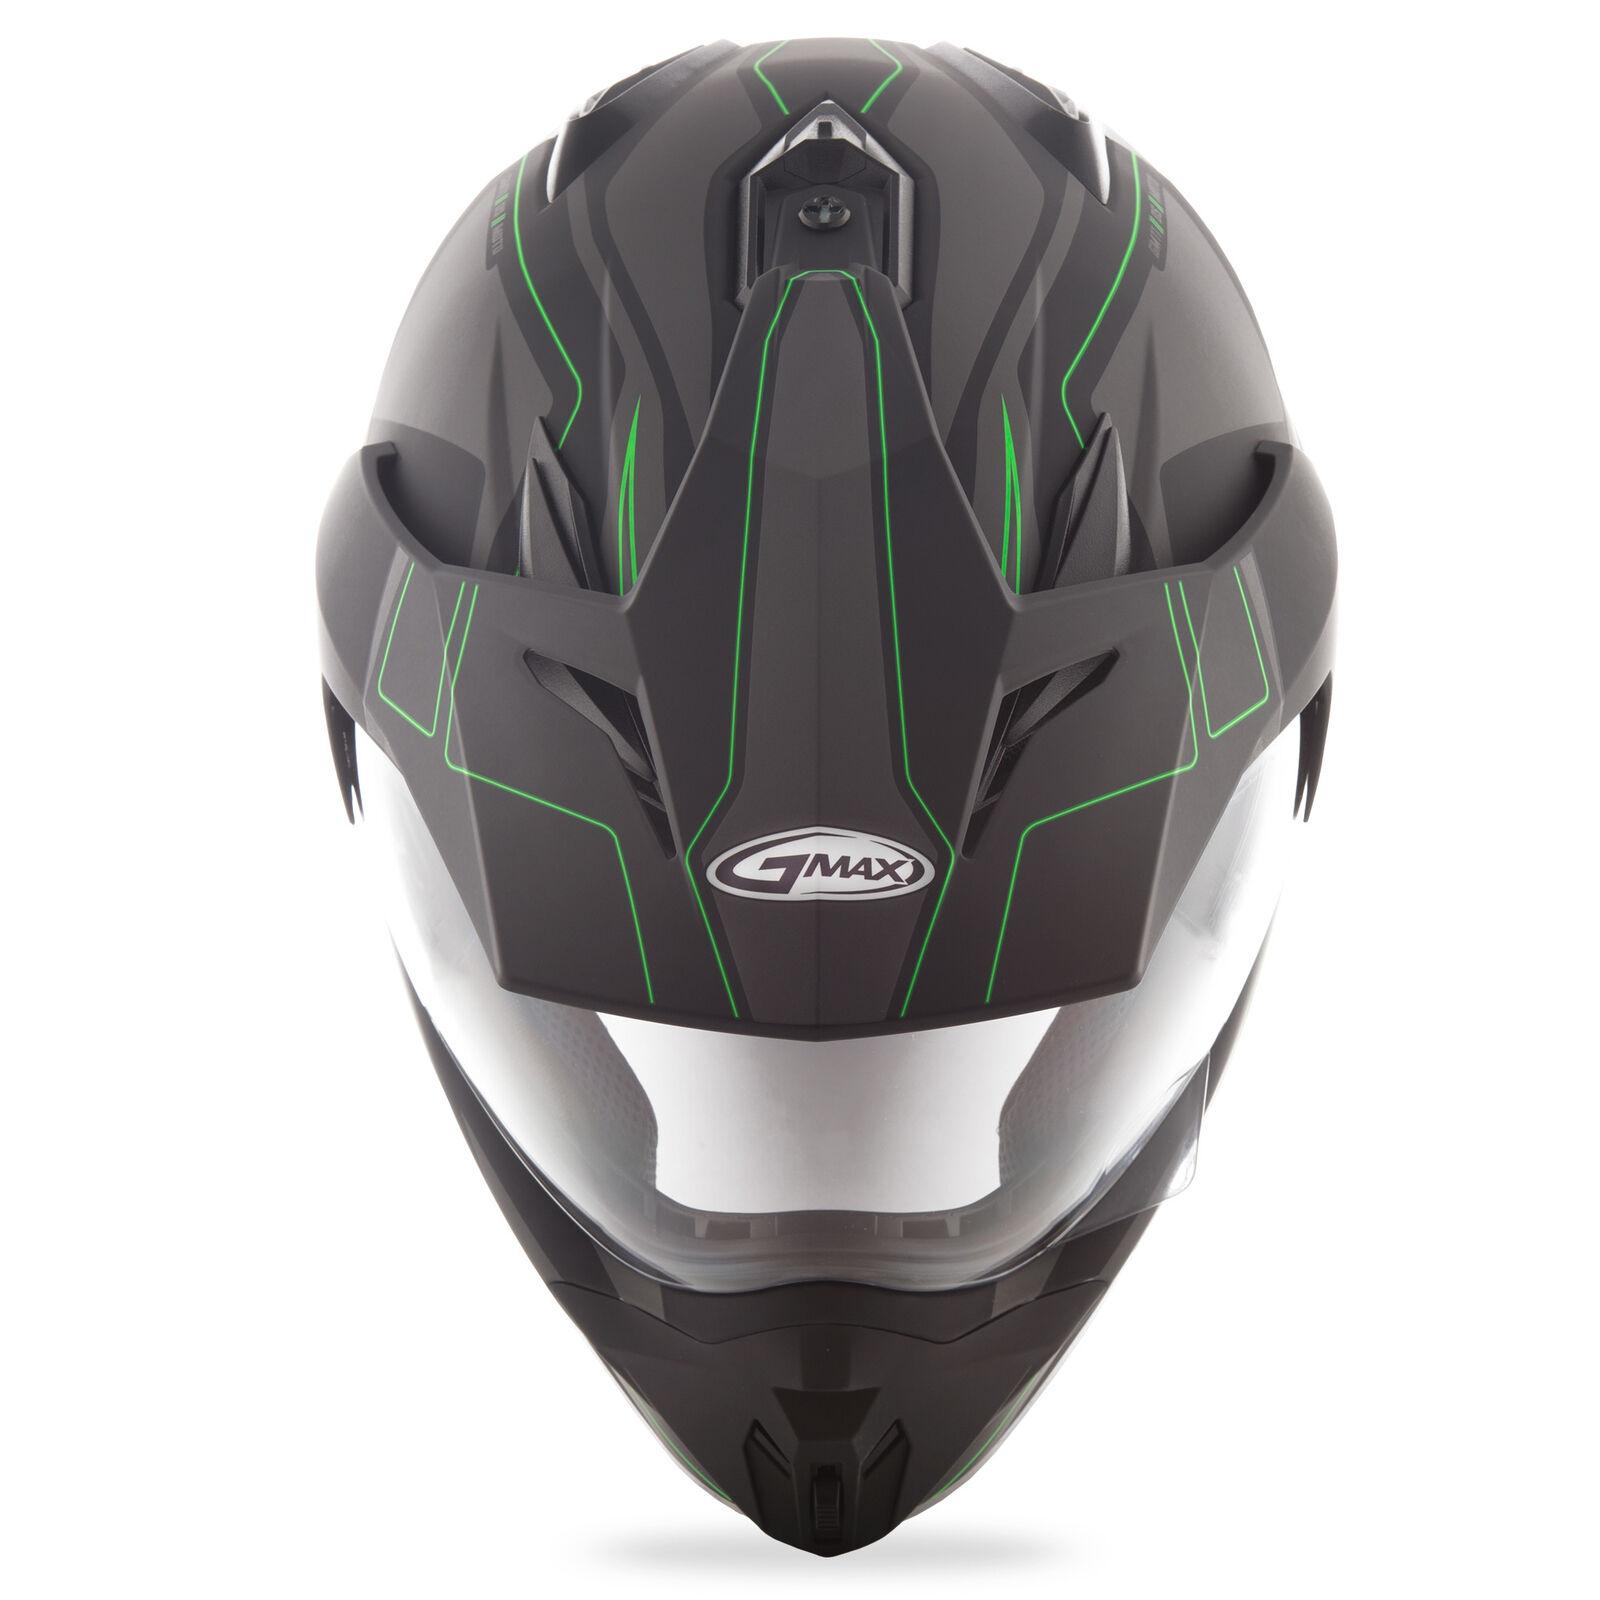 GMAX Unisex-Adult Full-face Style G5112673 TC-23 Gm11 Expedition Helmet Flat Black//Hi-Vis Green xs X-Small G5112673TC-23